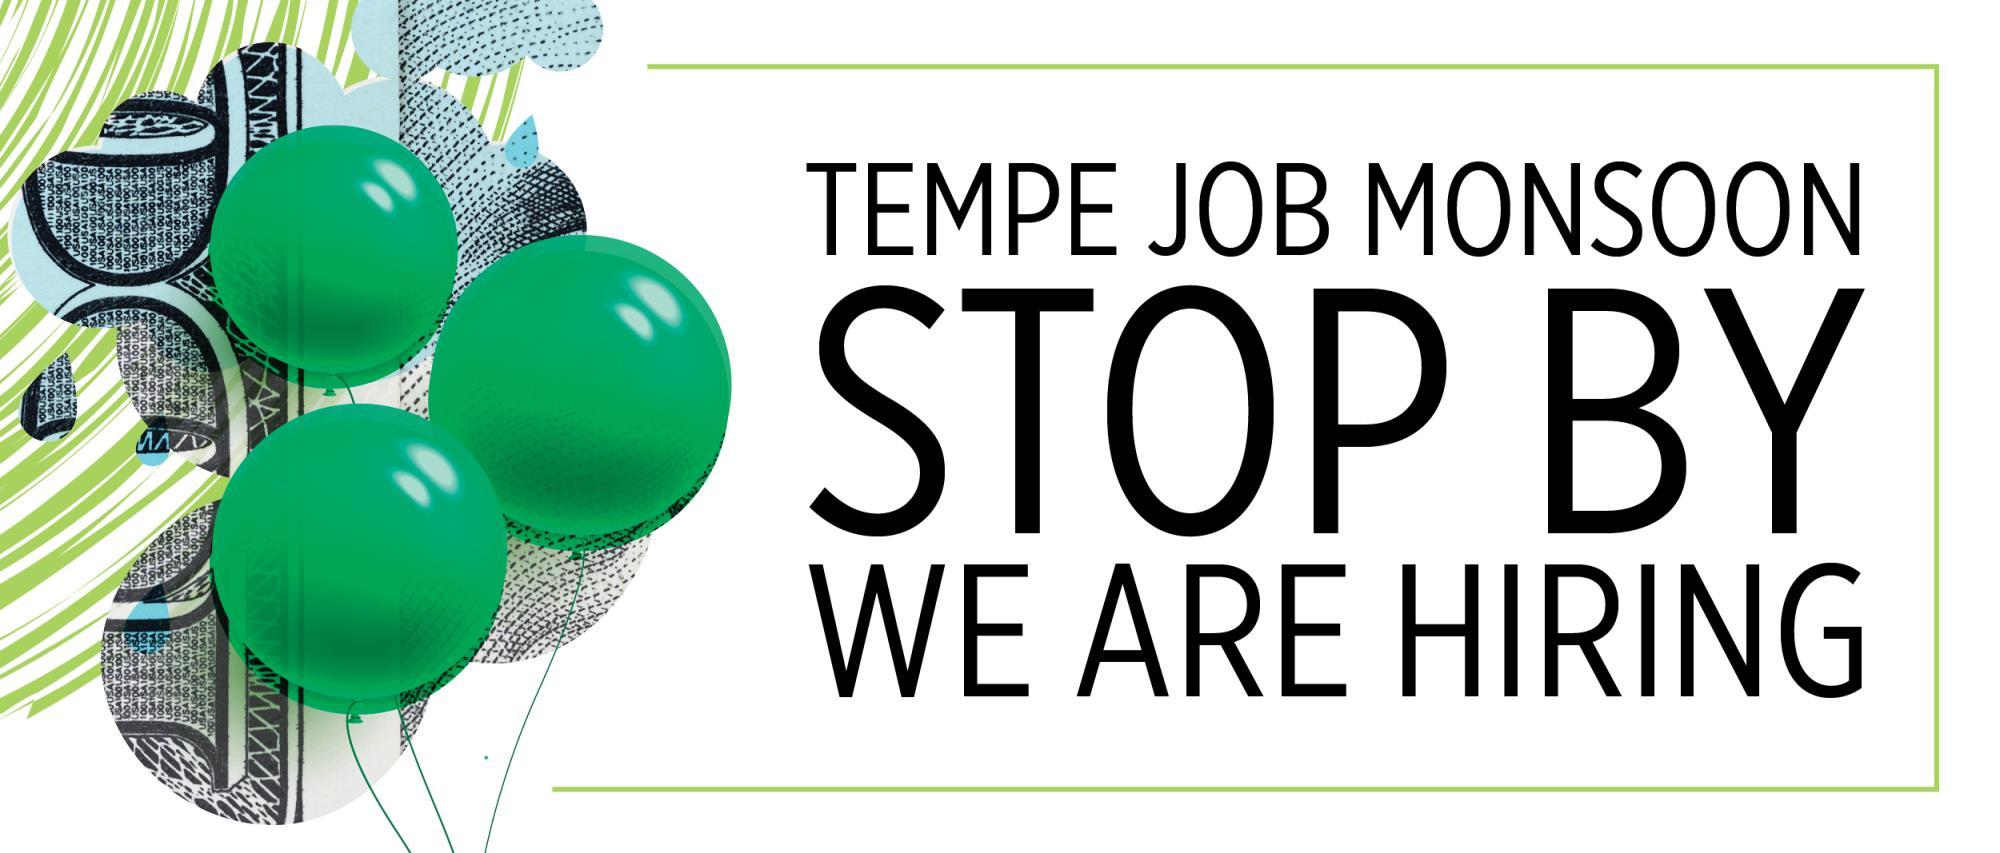 Temple Job Monsoon Citywide Job Fair